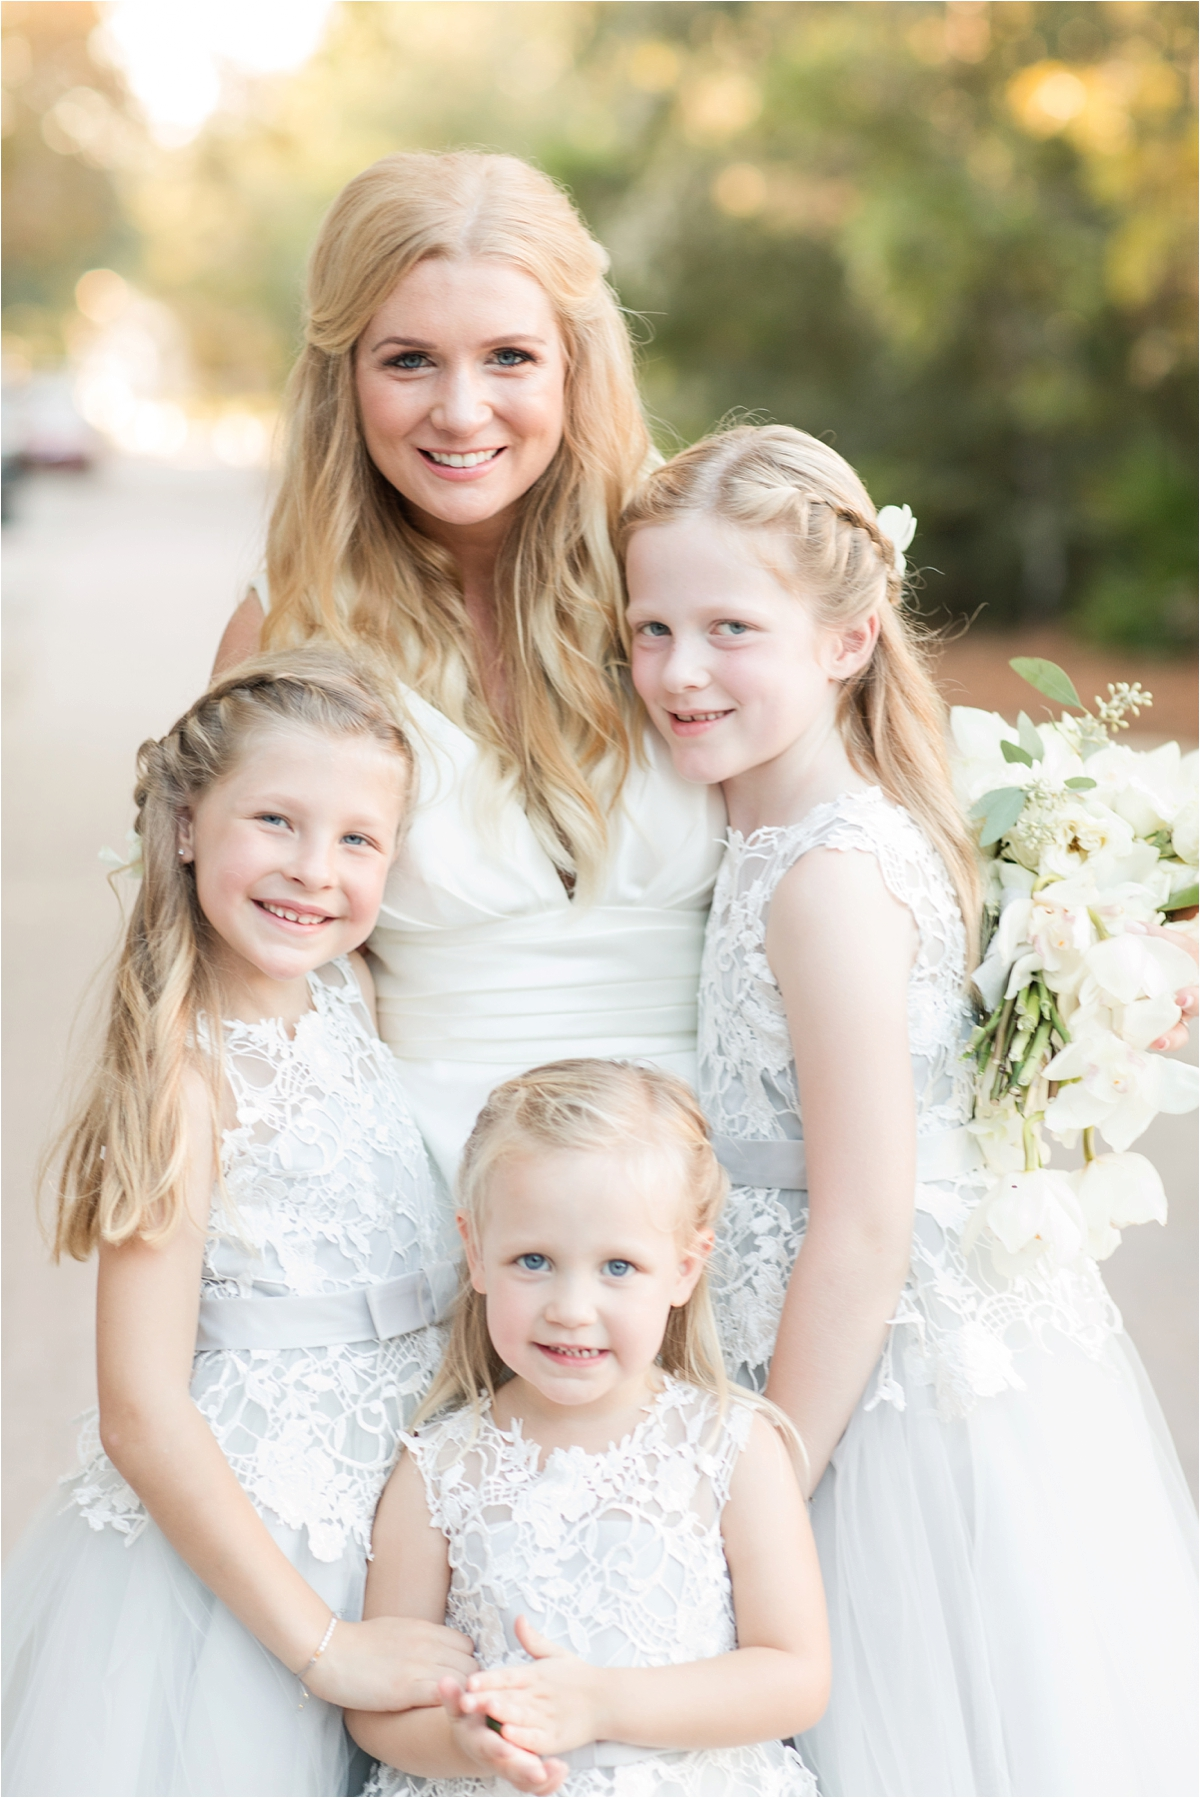 Seaside Florida Wedding Photographer-Catherine Carter + Brian-Alabama photographer-Bride and flower girls